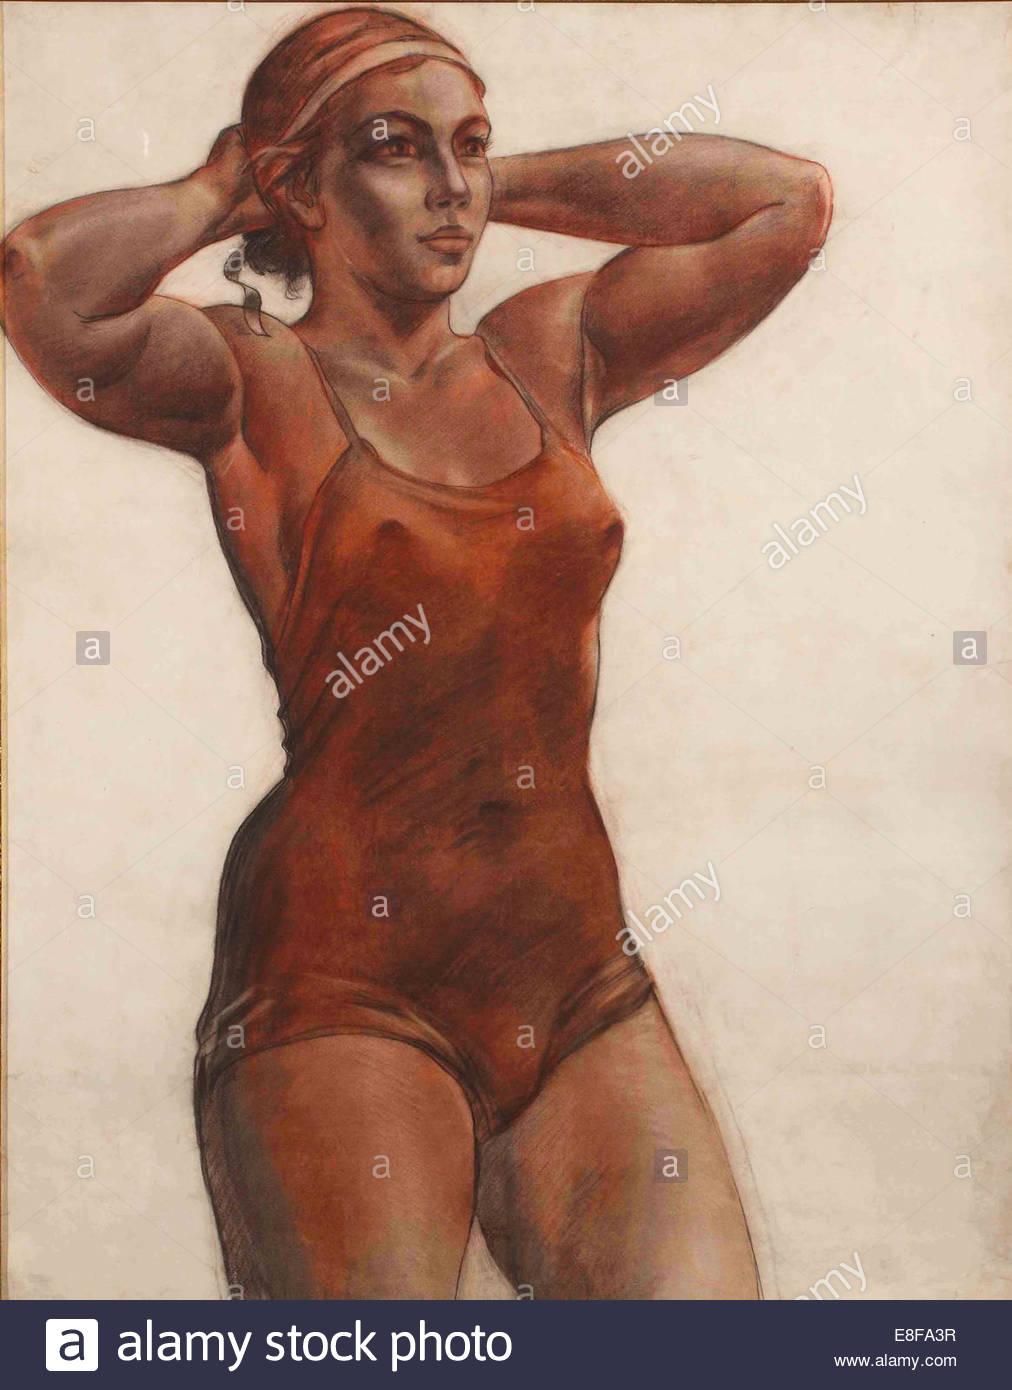 Sports woman. Artist: Deineka, Alexander Alexandrovich (1899-1969) - Stock Image